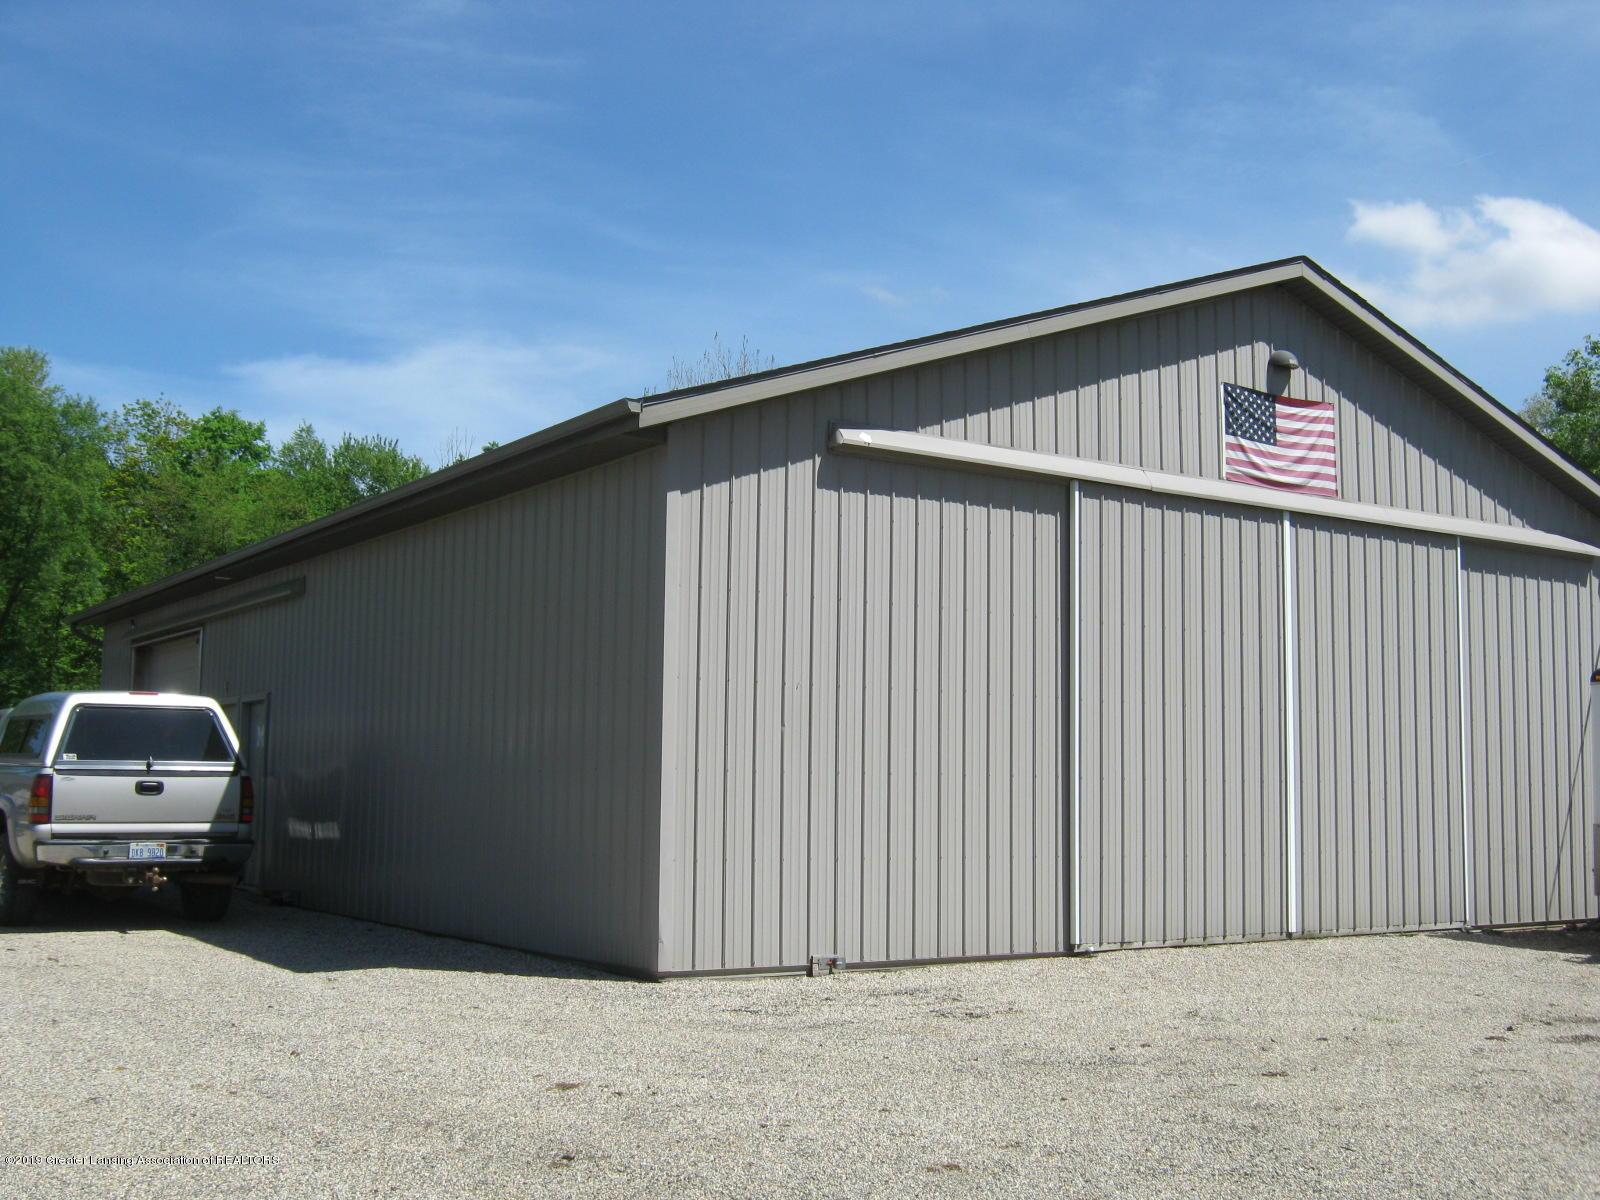 2749 S Bradley Rd - 10 Pole Barn - 10